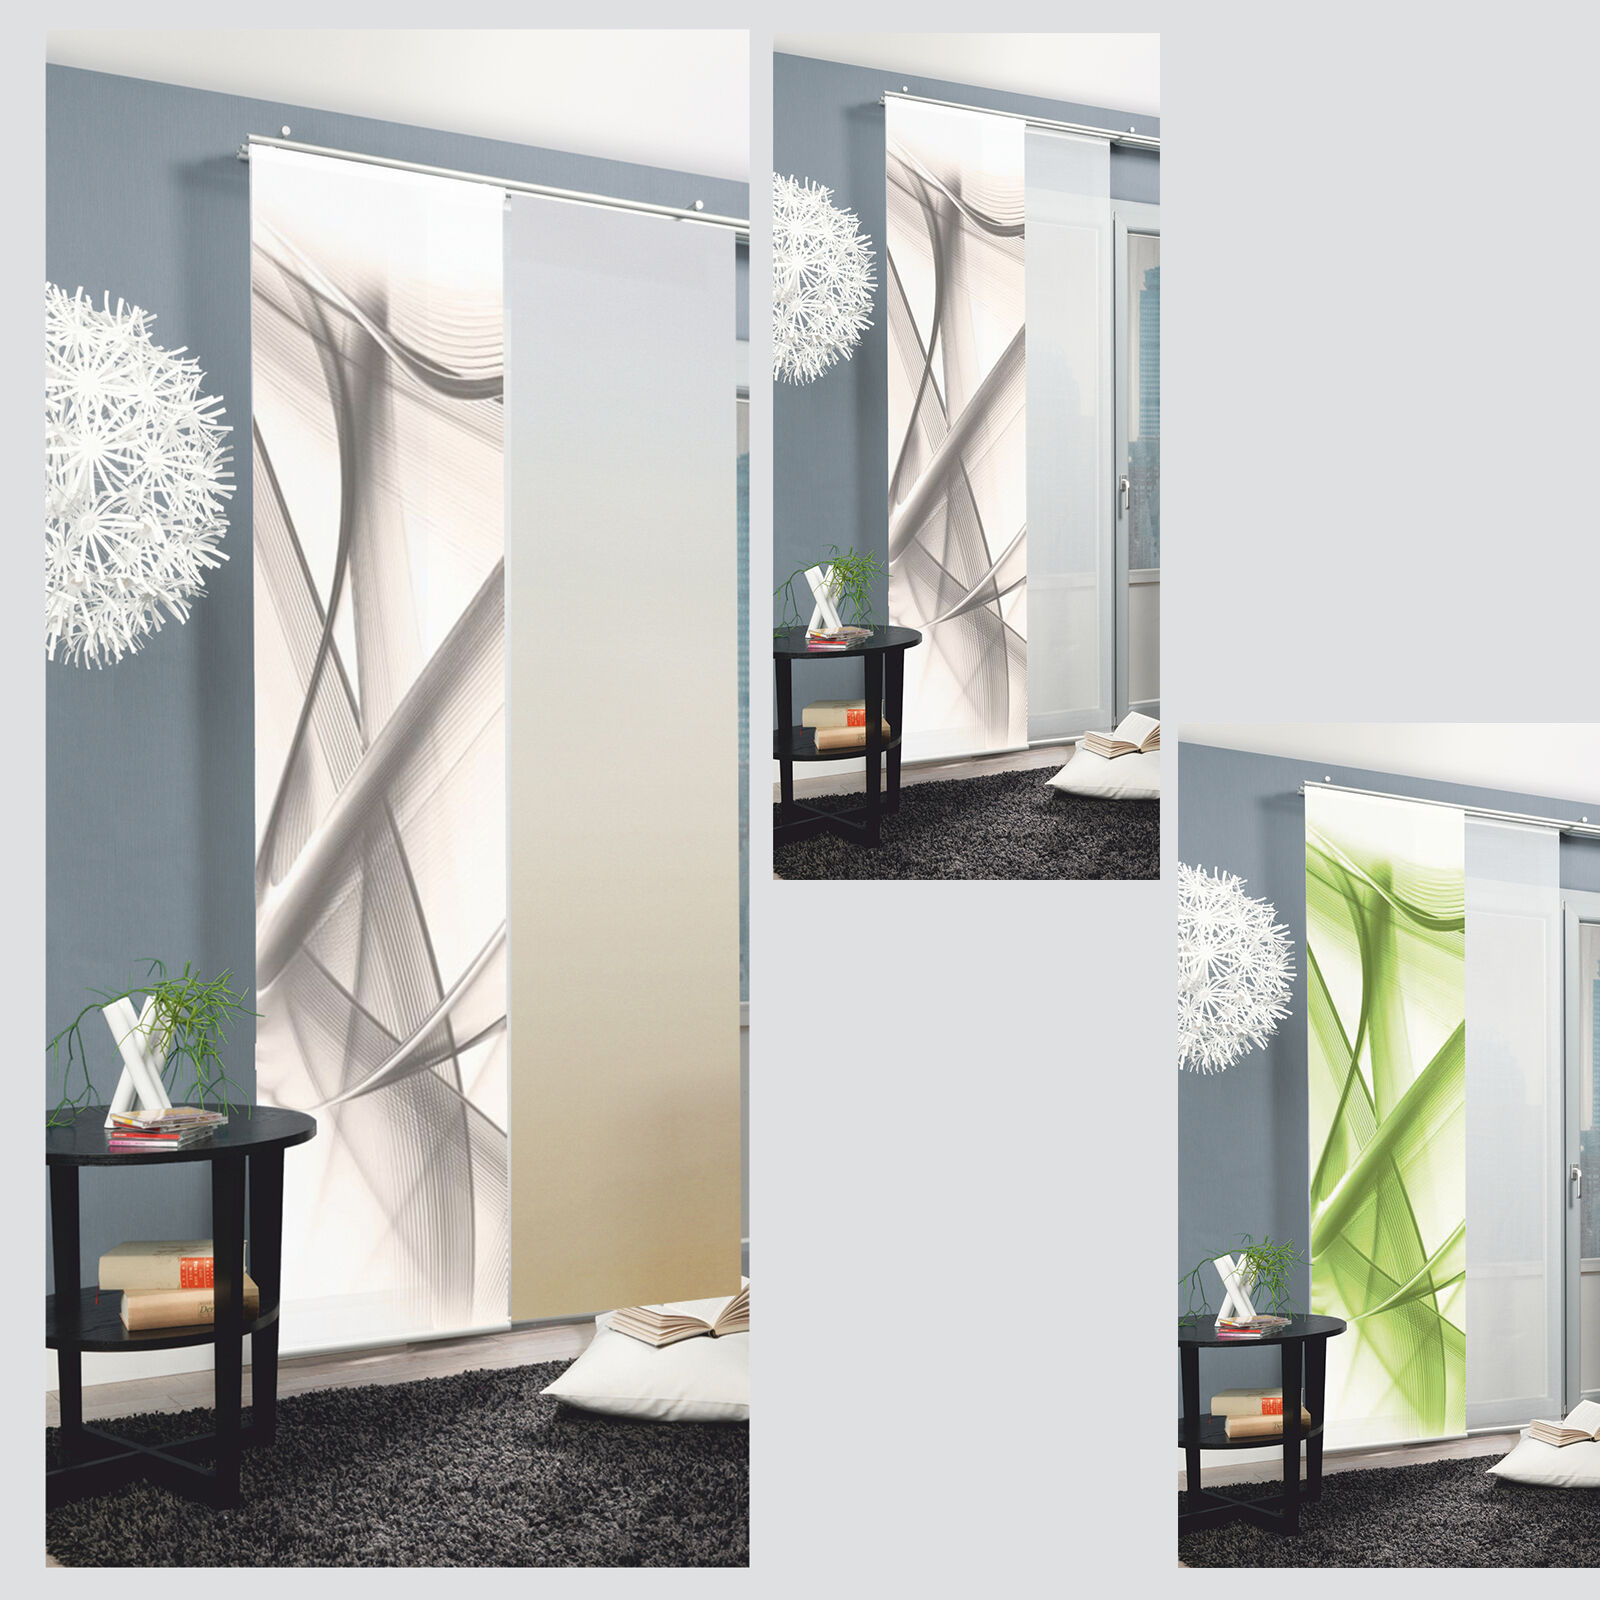 aaa yukon schiebevorhang schiebegardine raumteiler digital home wohnideen ebay. Black Bedroom Furniture Sets. Home Design Ideas